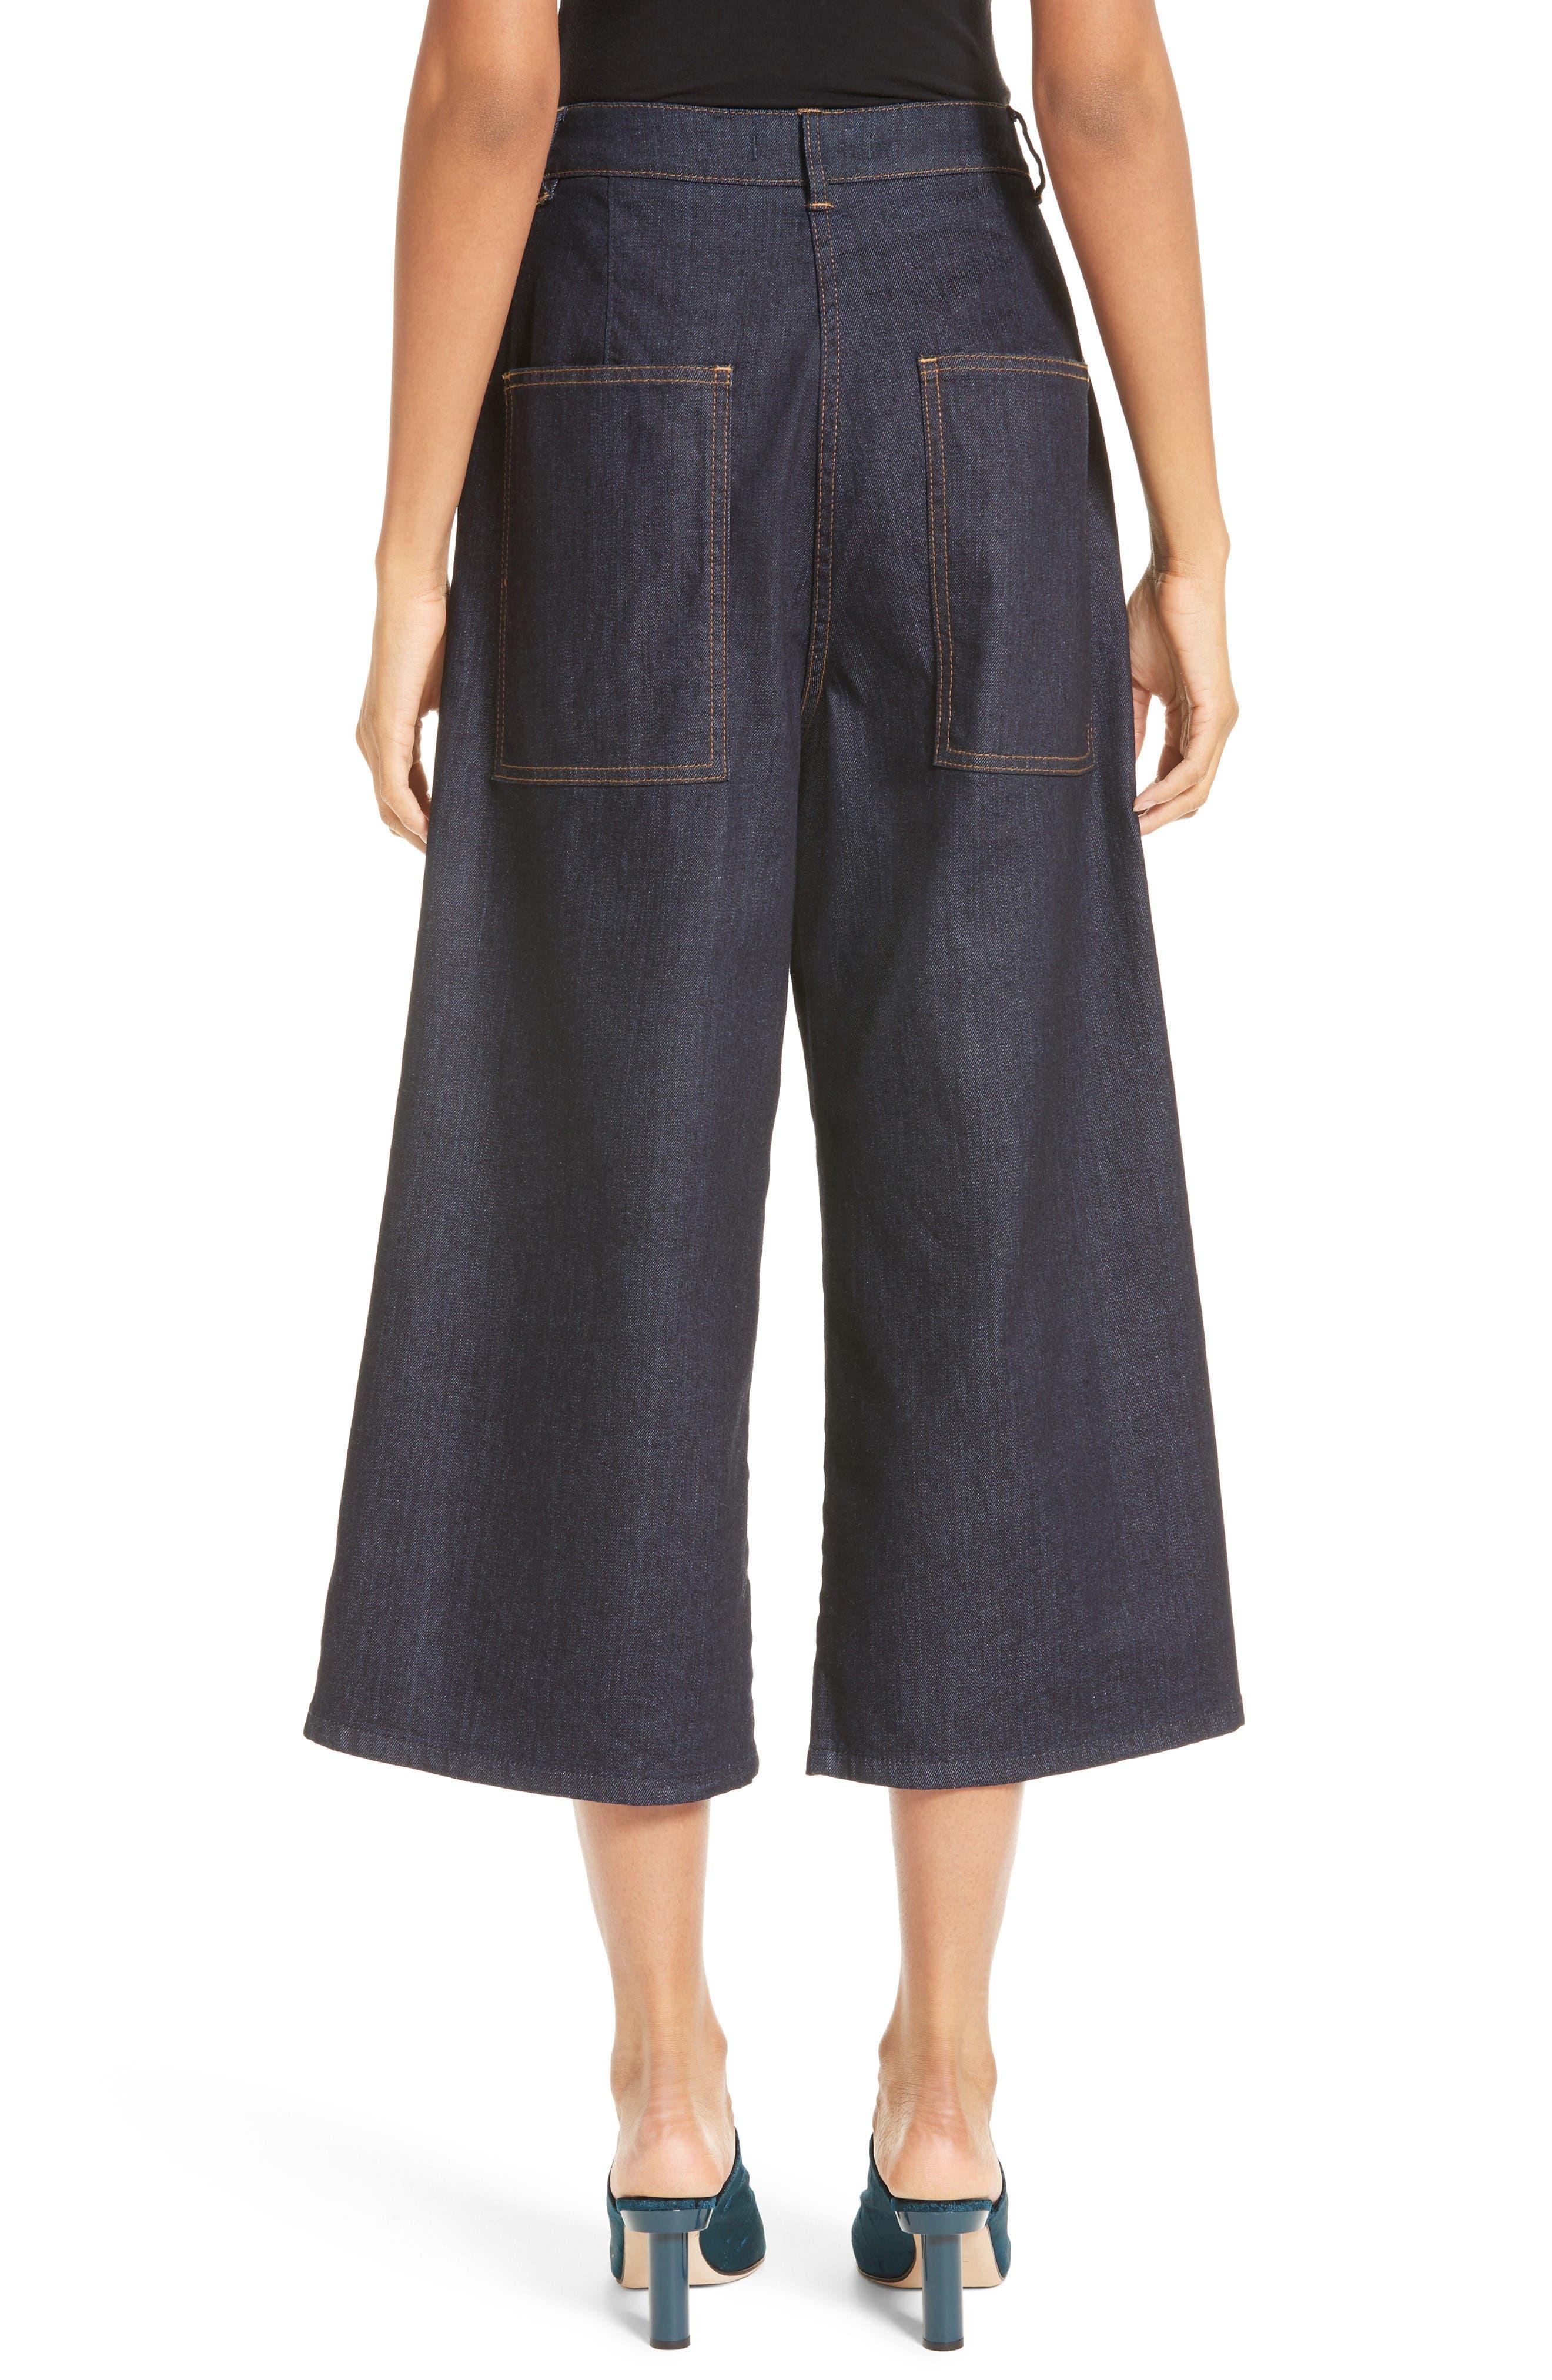 Sam High Waist Culotte Jeans,                             Alternate thumbnail 3, color,                             Dark Denim